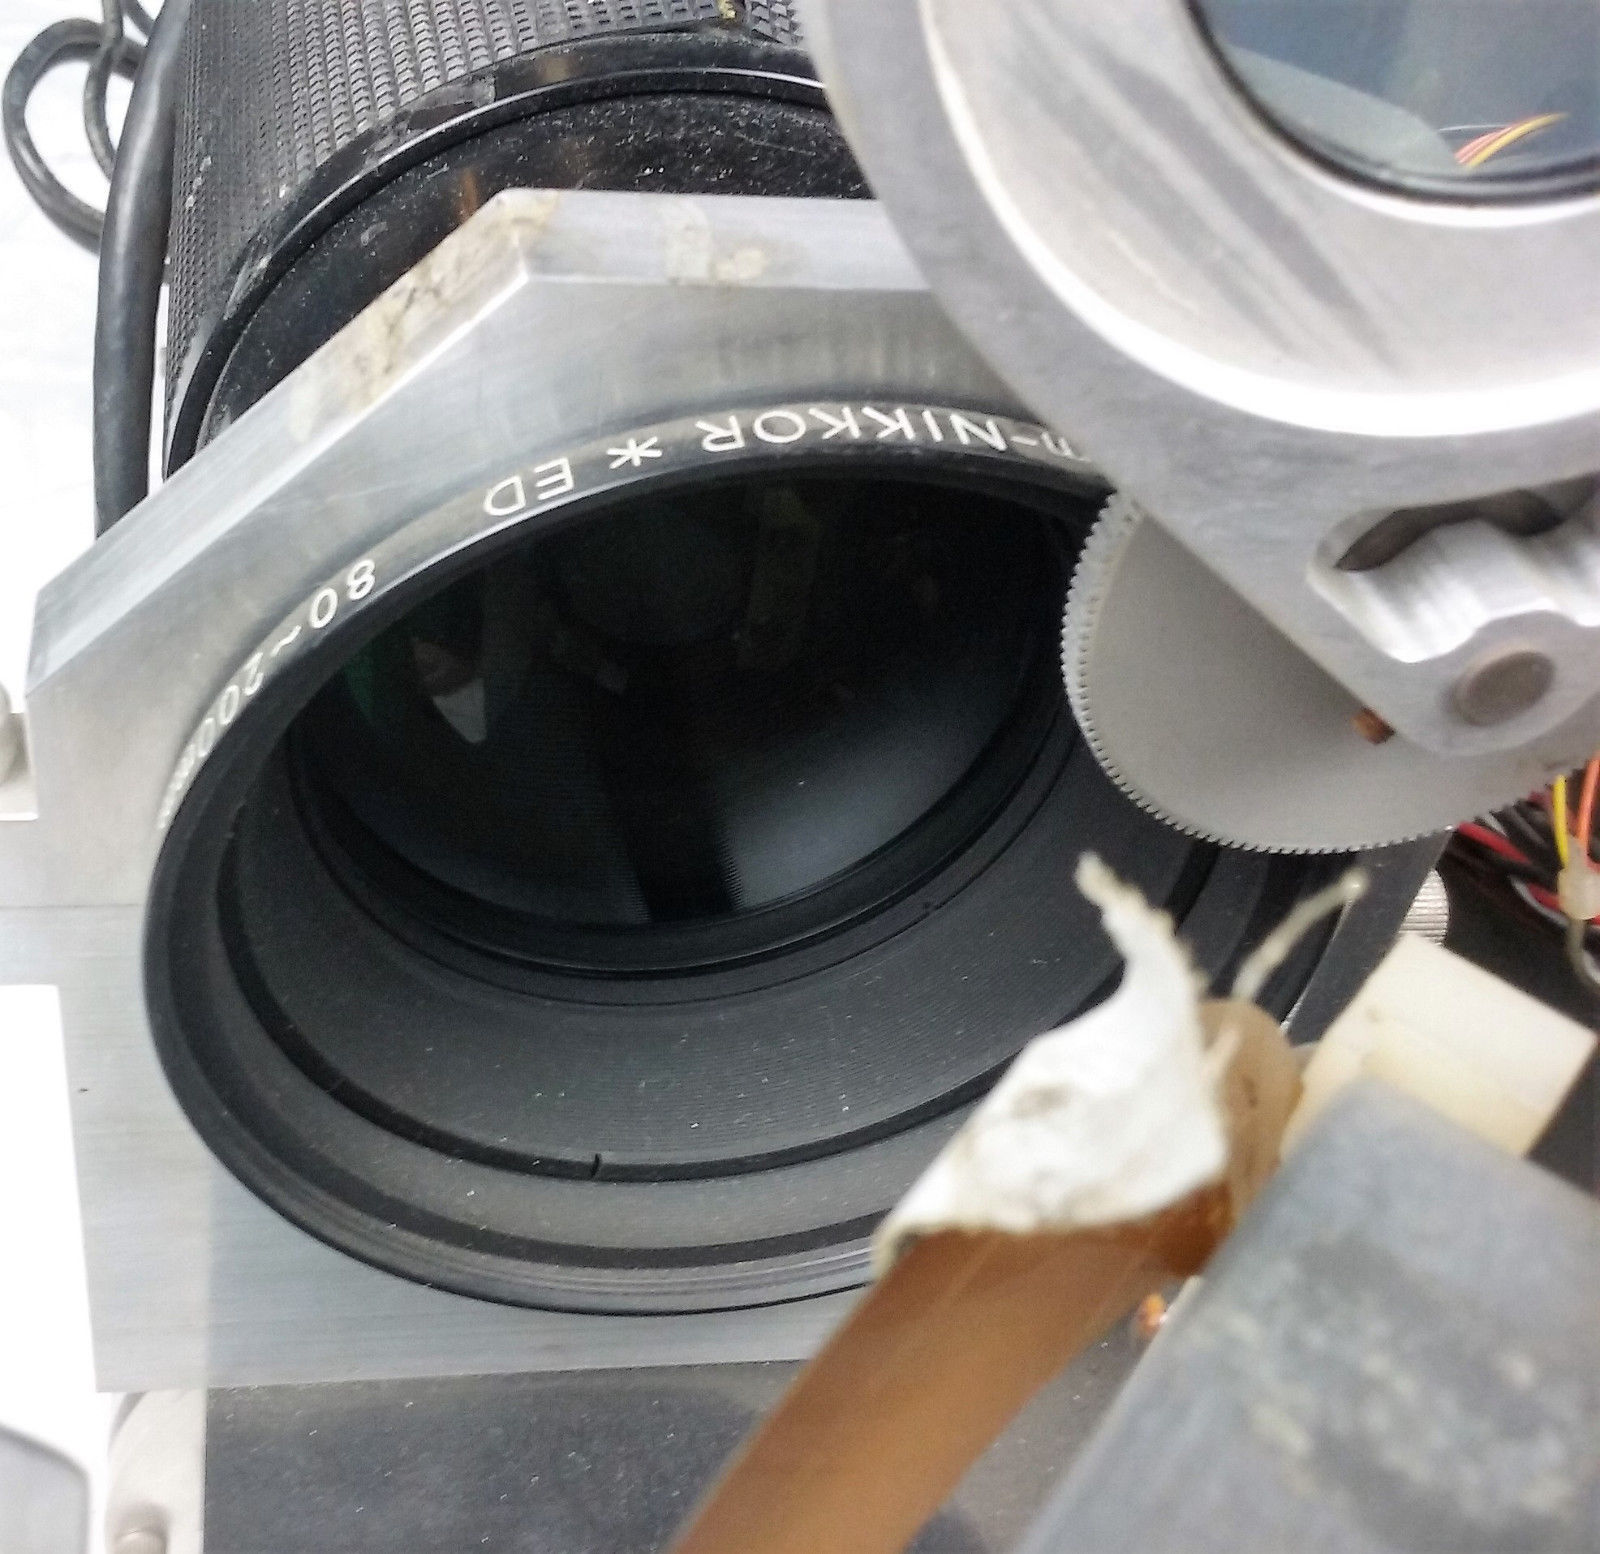 Newport Optical Mount 600A-4 Nikkor 80-200mm Lab Equipment Laser Photonics Lens image 8